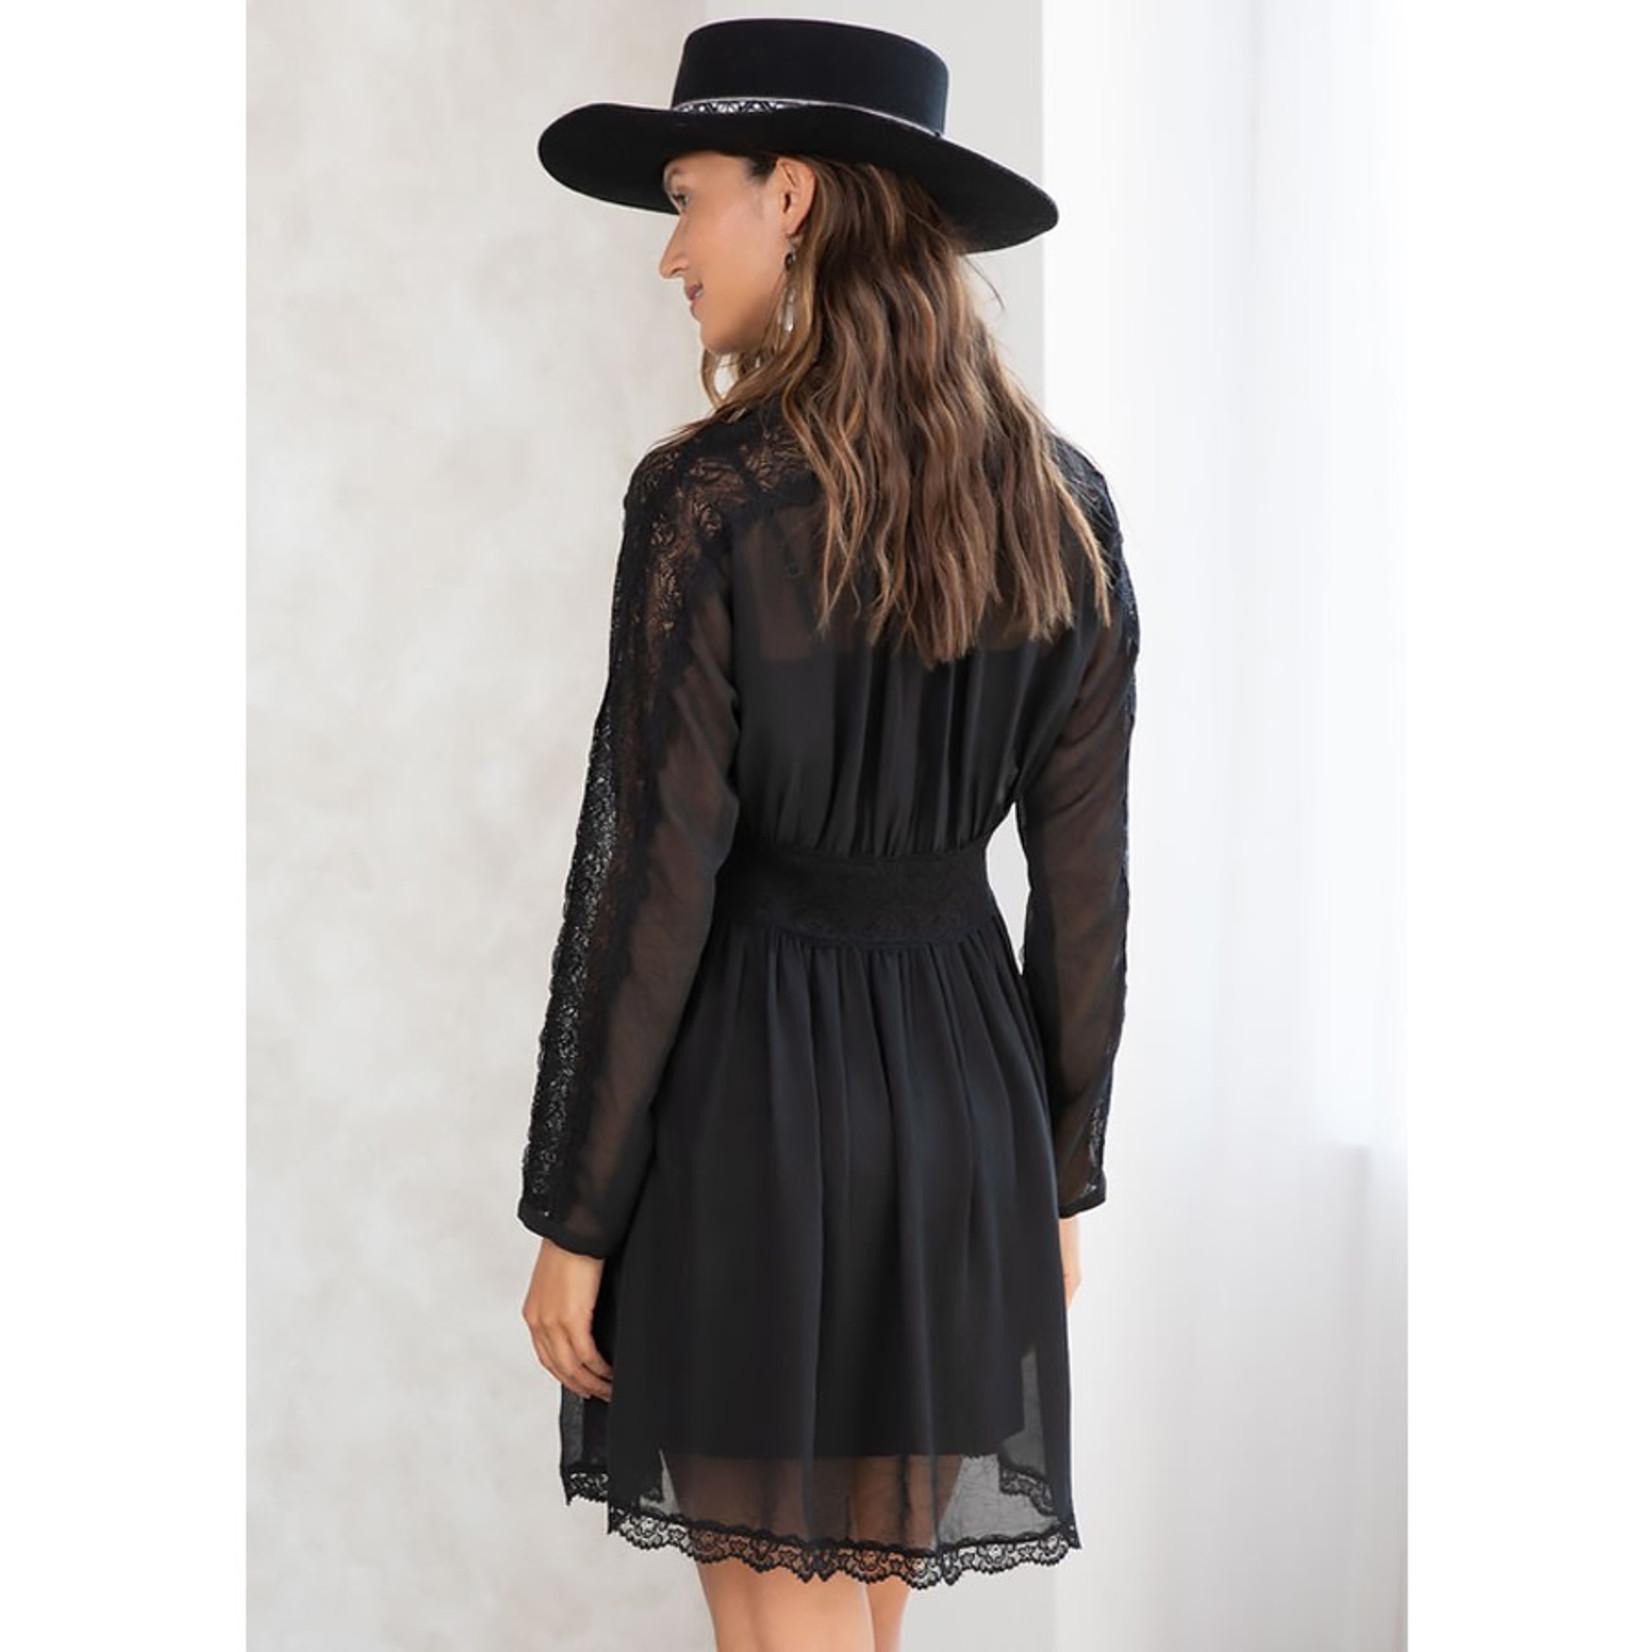 LOVESTITCH Lacey Days Mini Dress